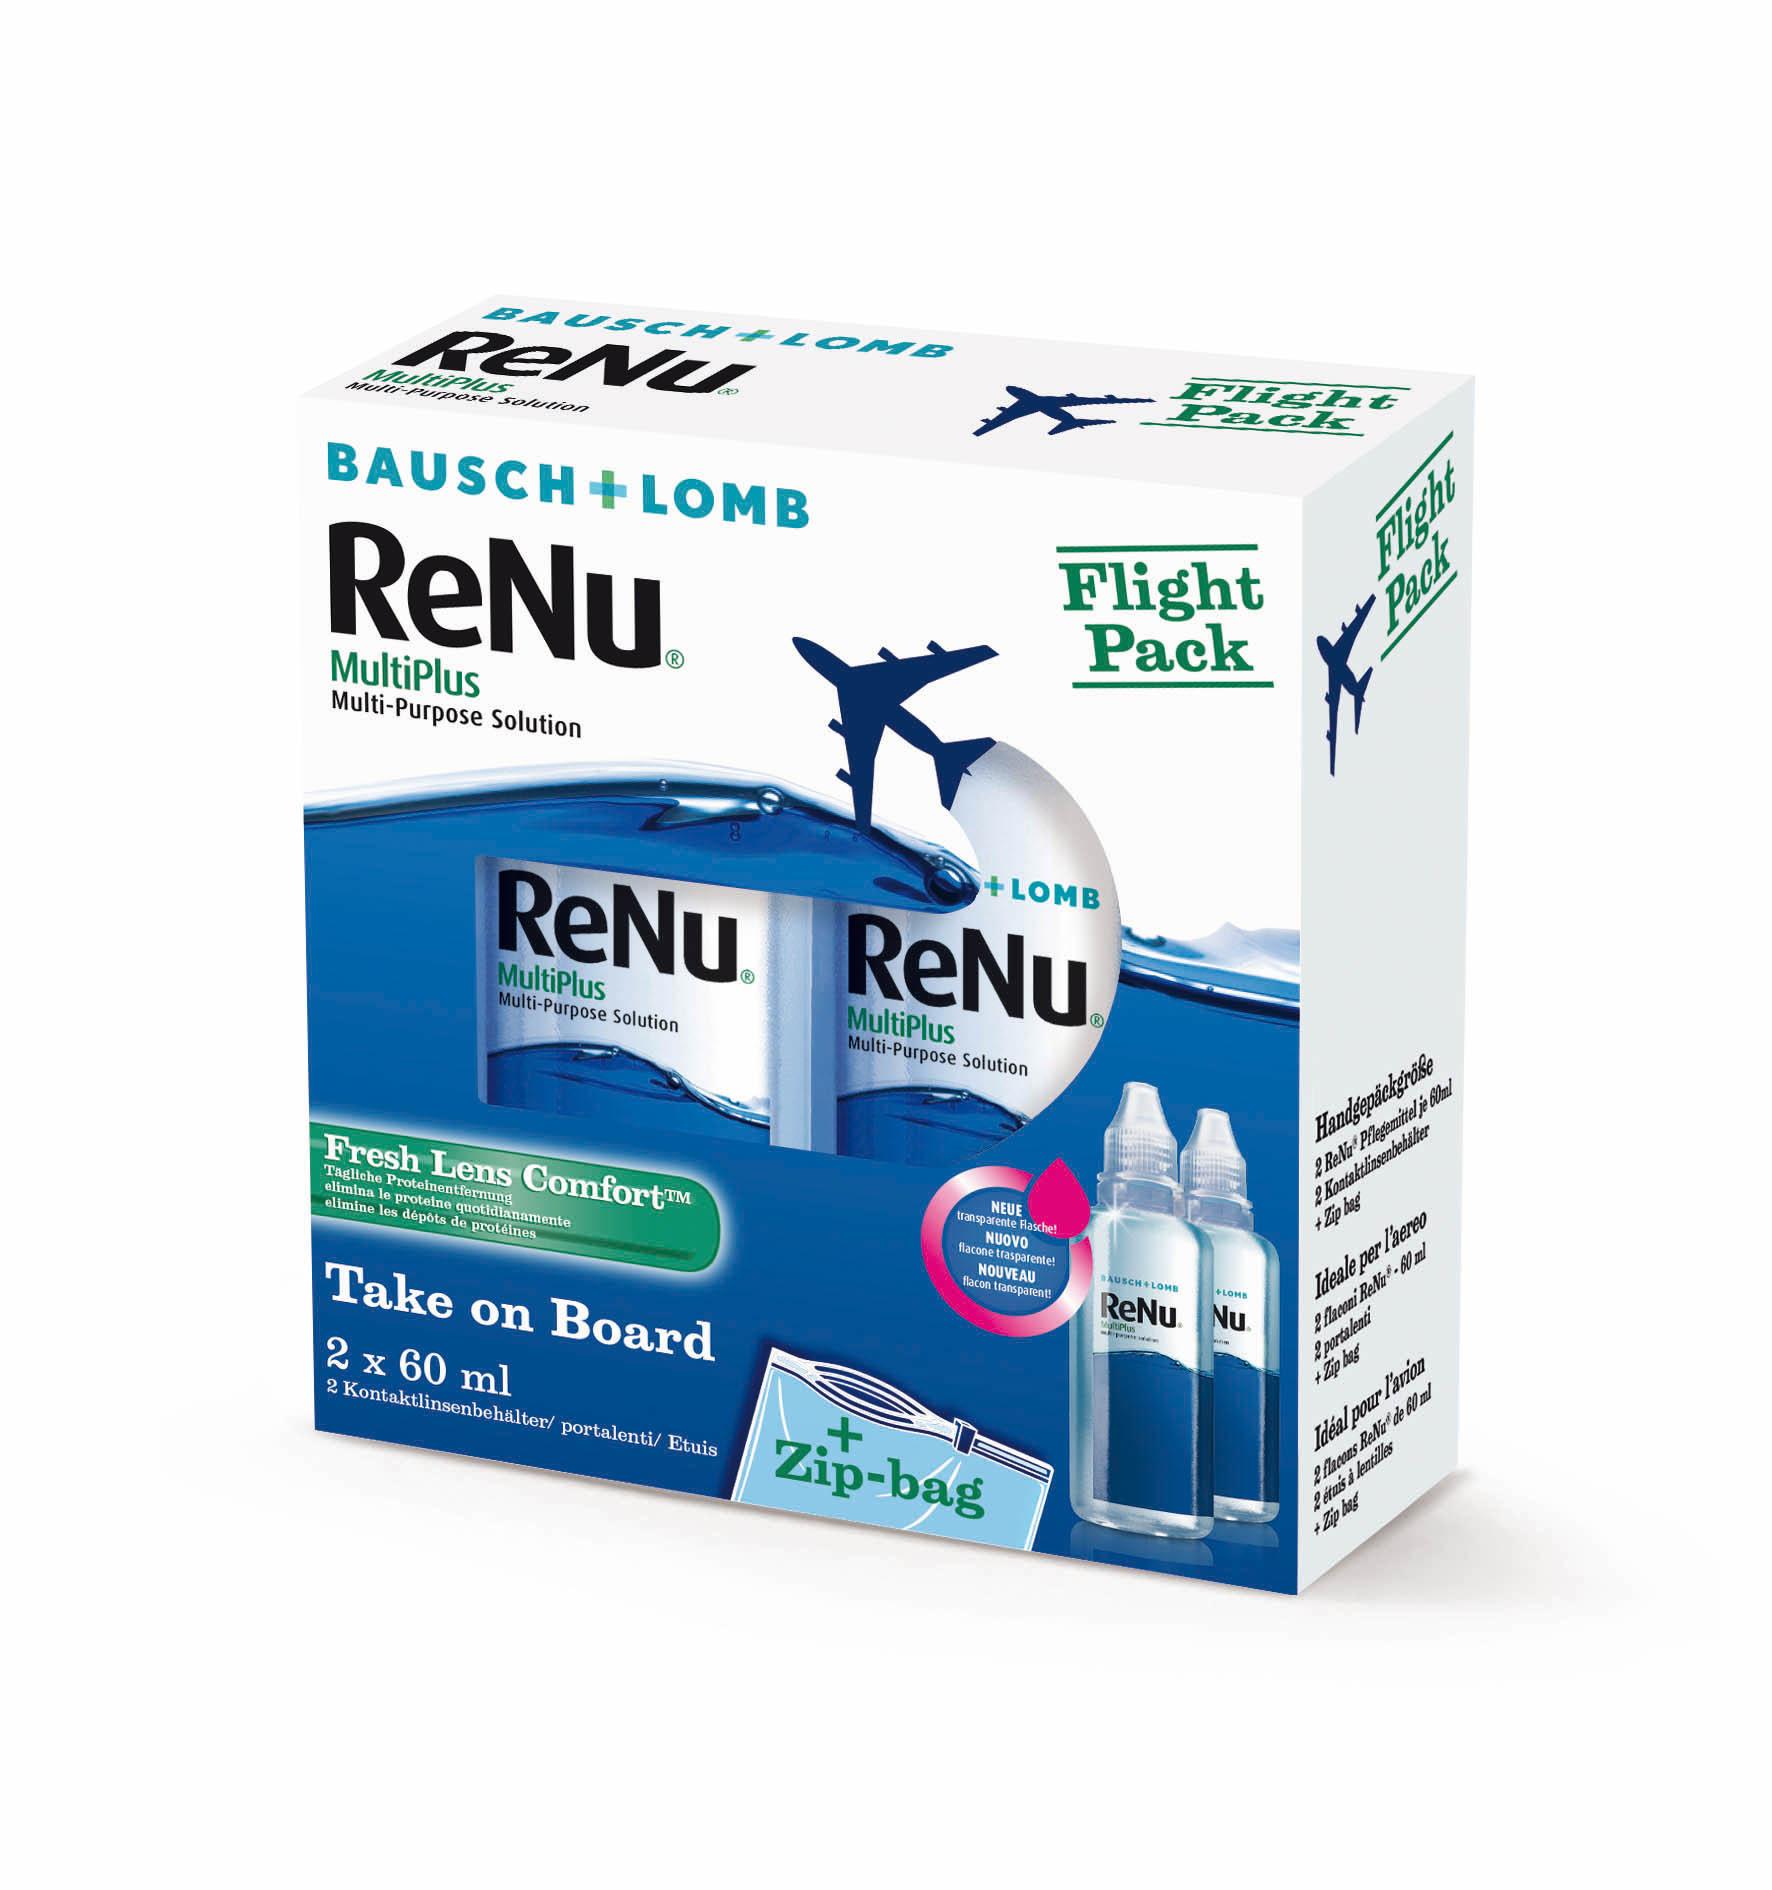 ReNu MultiPlus Flightpack, Bausch & Lomb (2 x 60 ml)